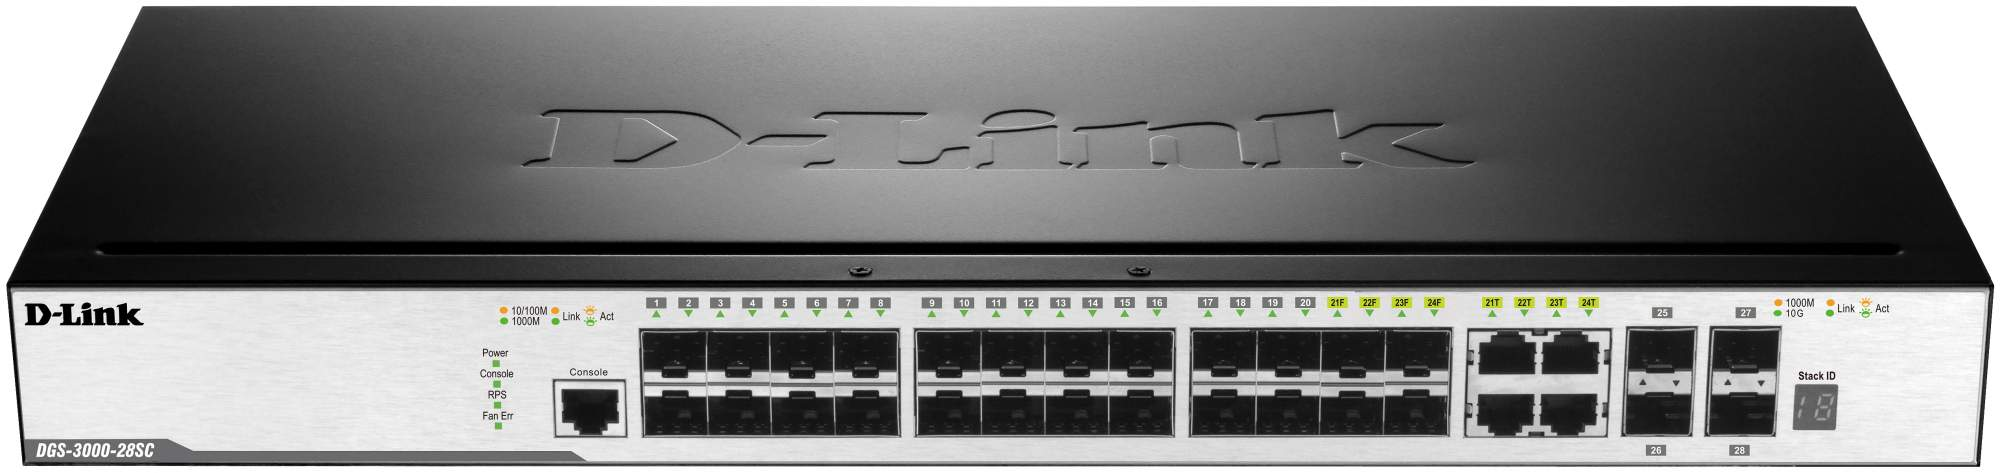 Коммутатор D-Link DGS-3000-28SC/A1A